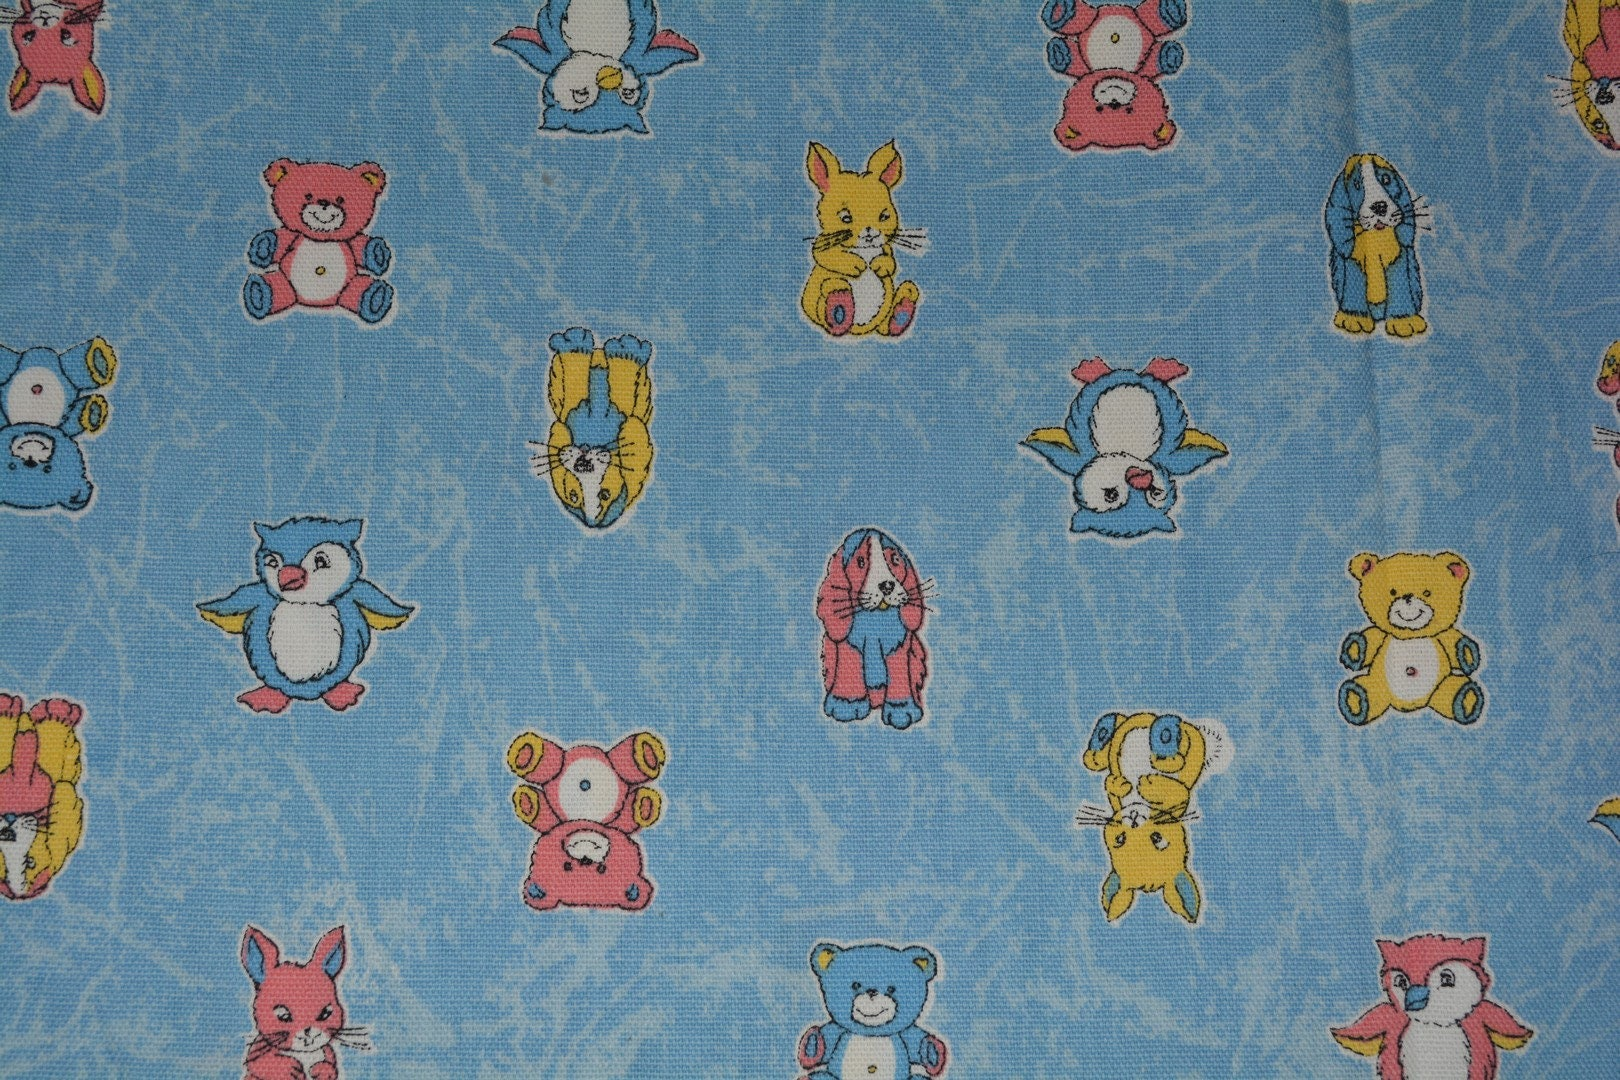 Novelty baby nursery decor upholstery fabric baby decor for Upholstery fabric children